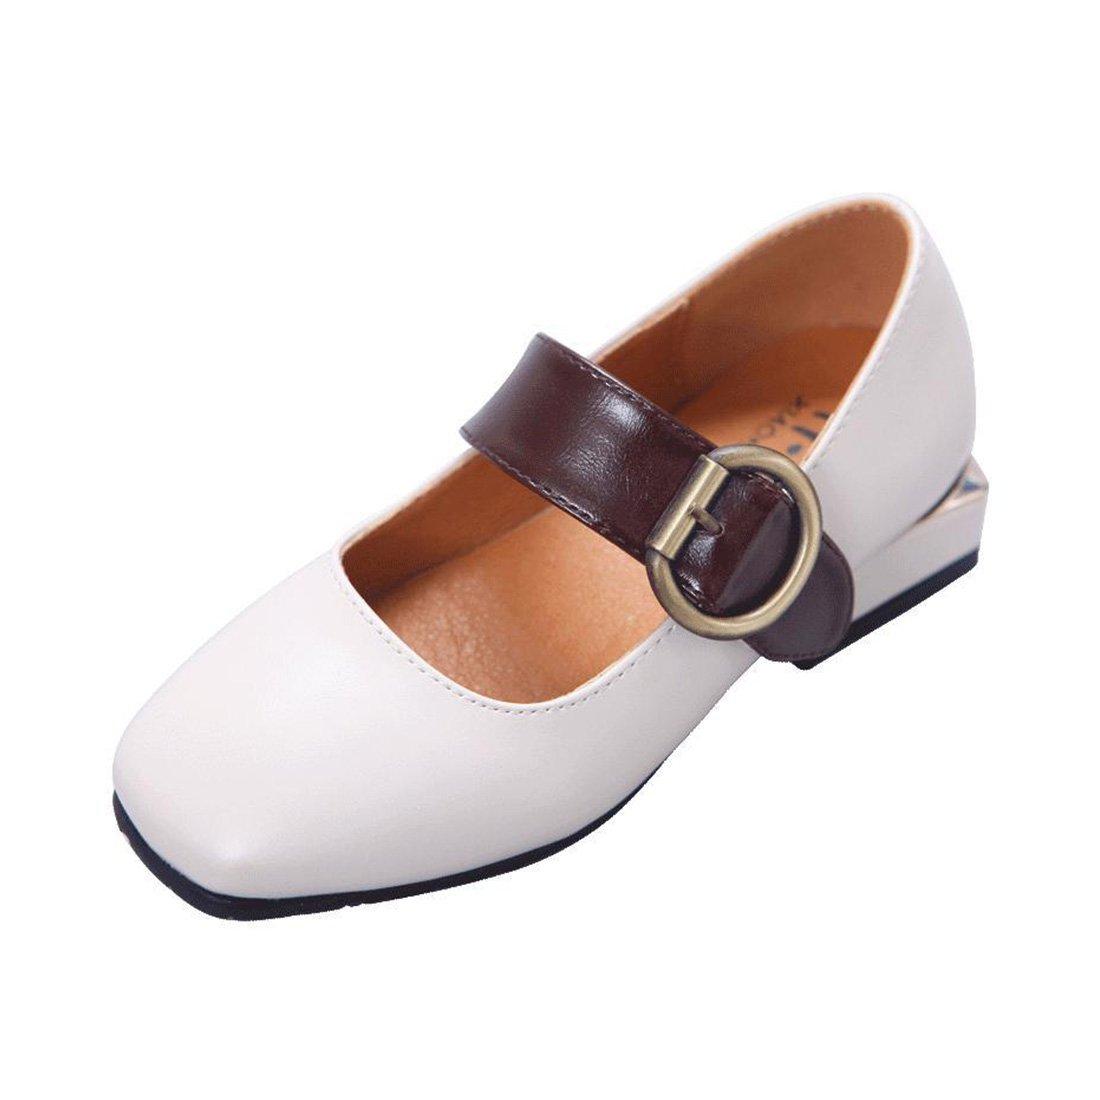 YIBLBOX Kids Girls Ballet Flats Shoes Mary Janes Wedding Party Princess Dress Toddler Shoes